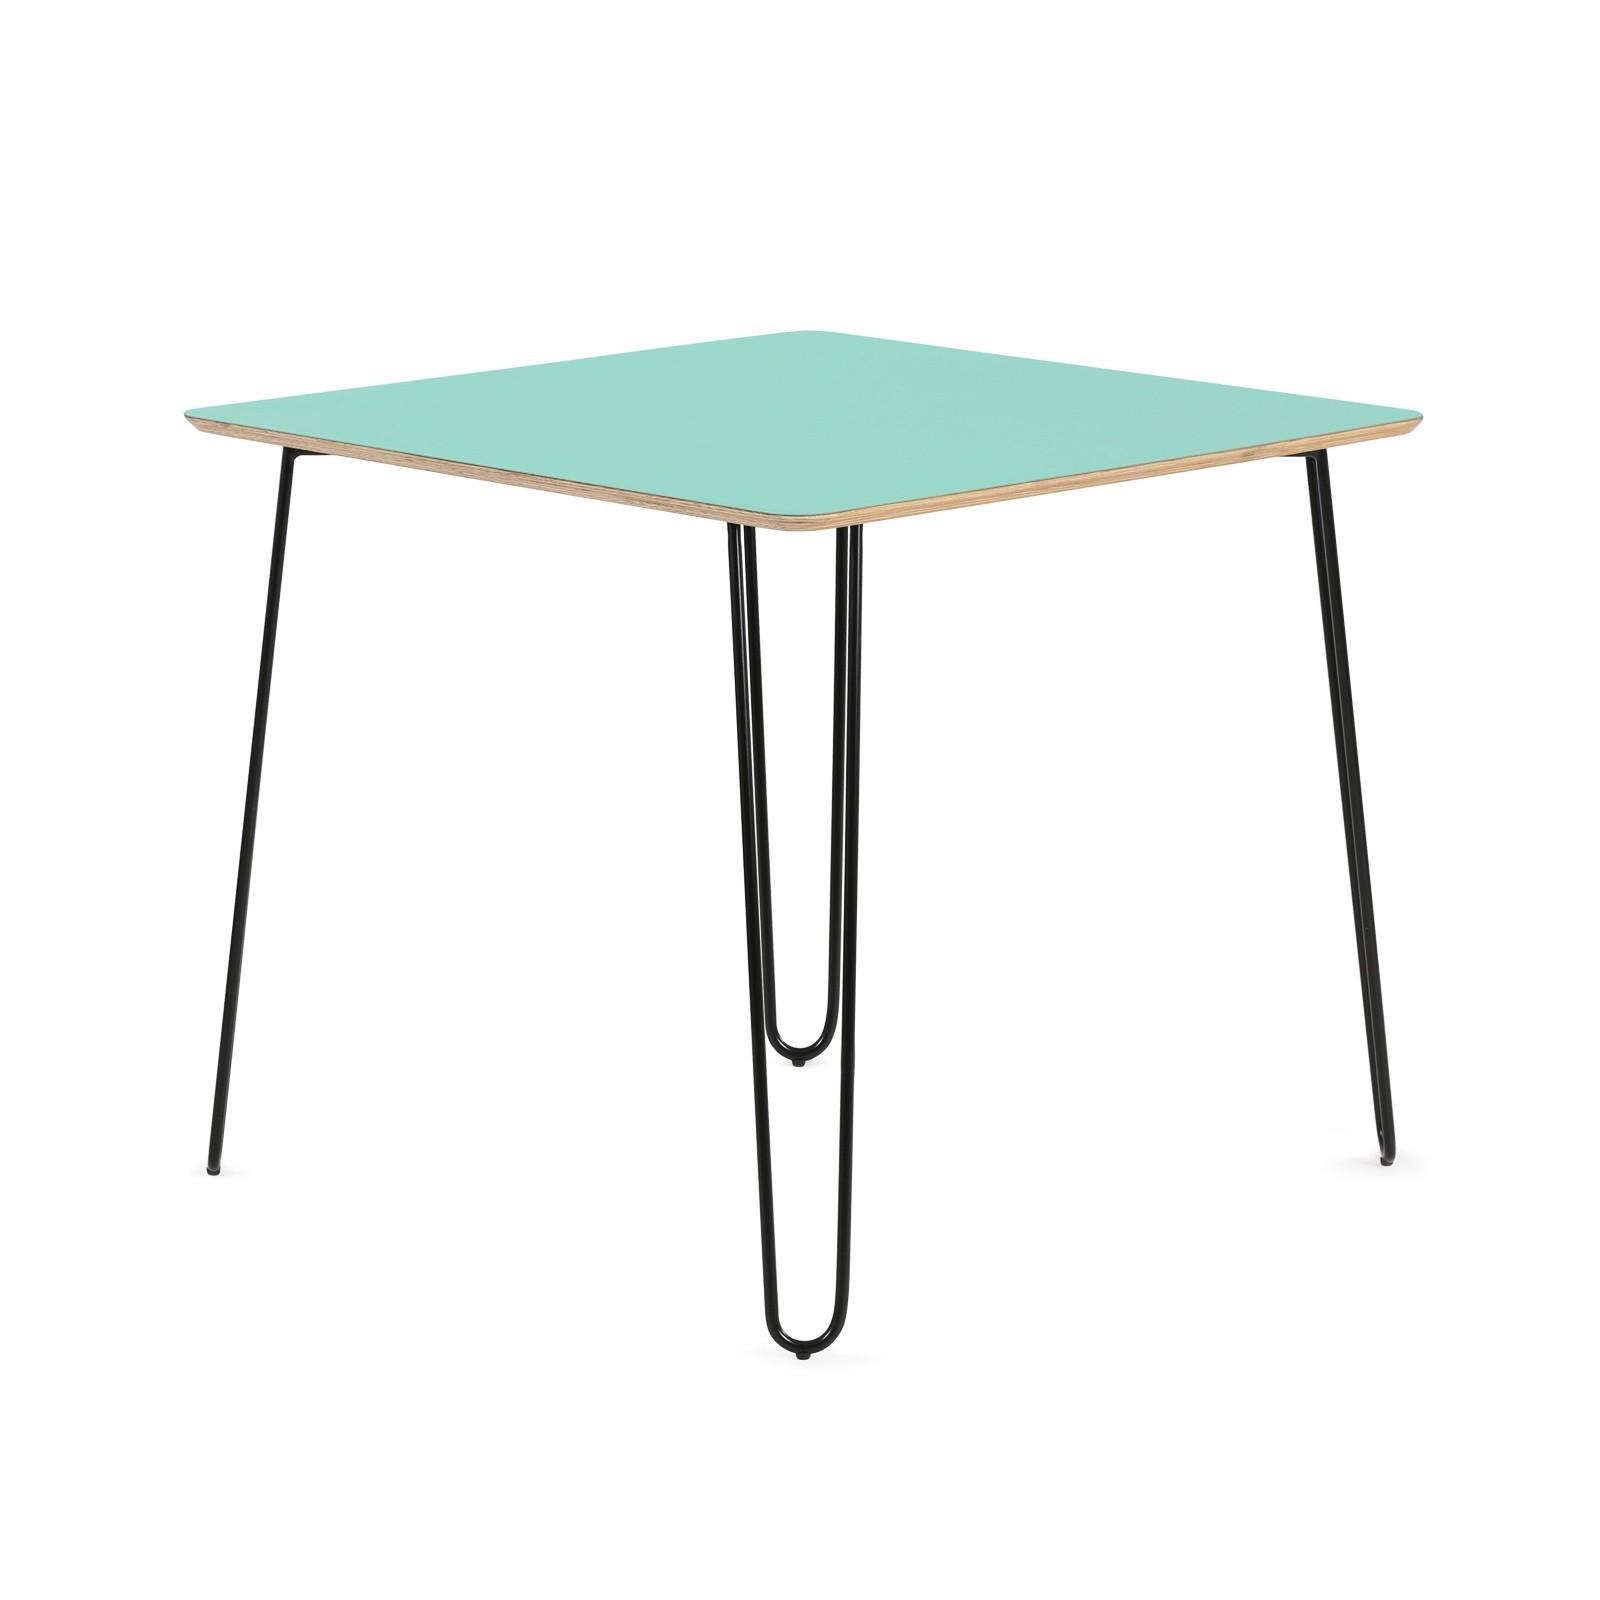 Stół Mannequin - MQ 03 - miętowy